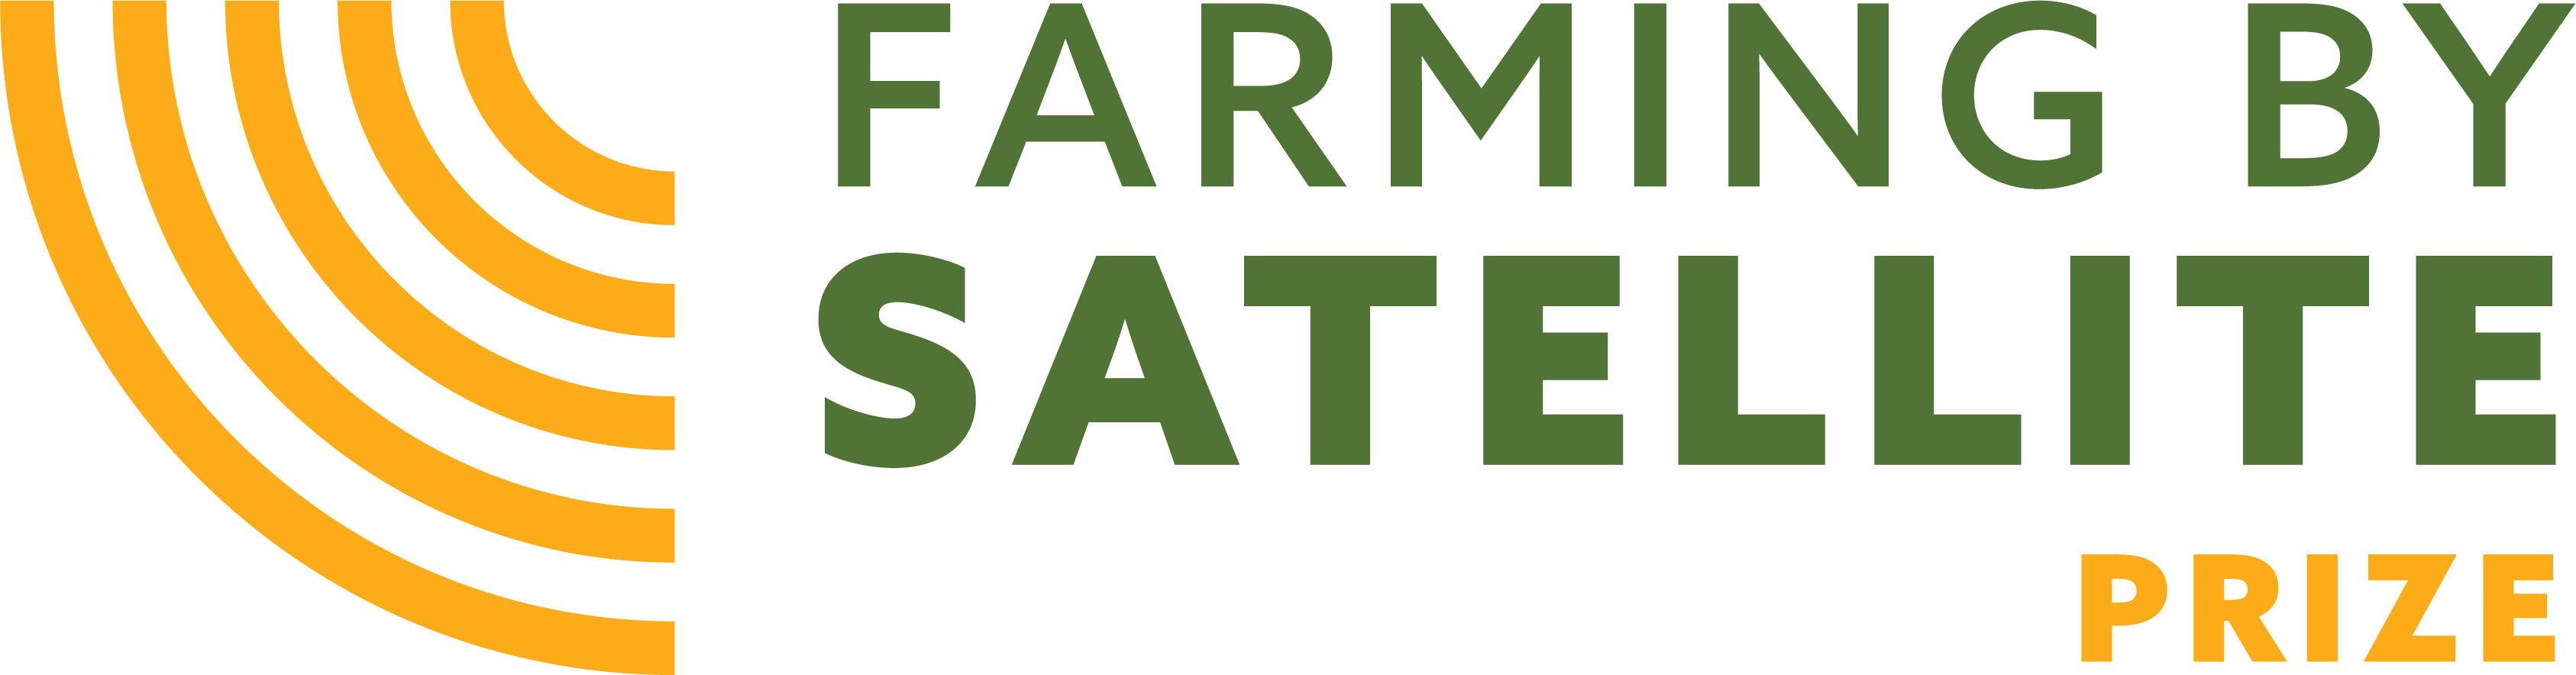 Farming by Satellite Logo